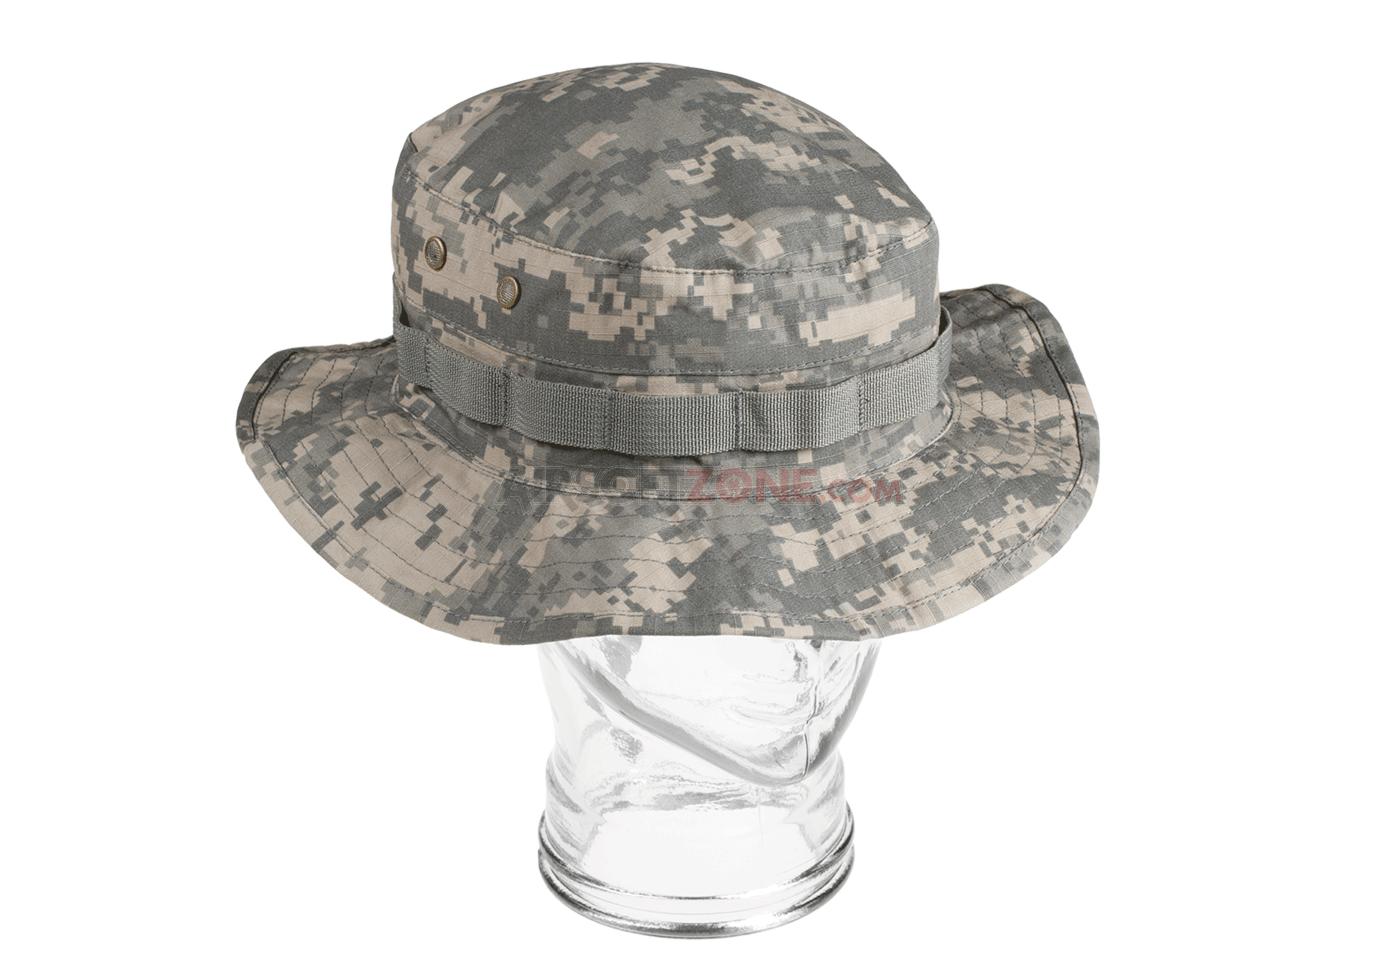 Boonie Hat ACU (Invader Gear) 59   L - Boonies - Headwear - Garments ... 40b8873fce47